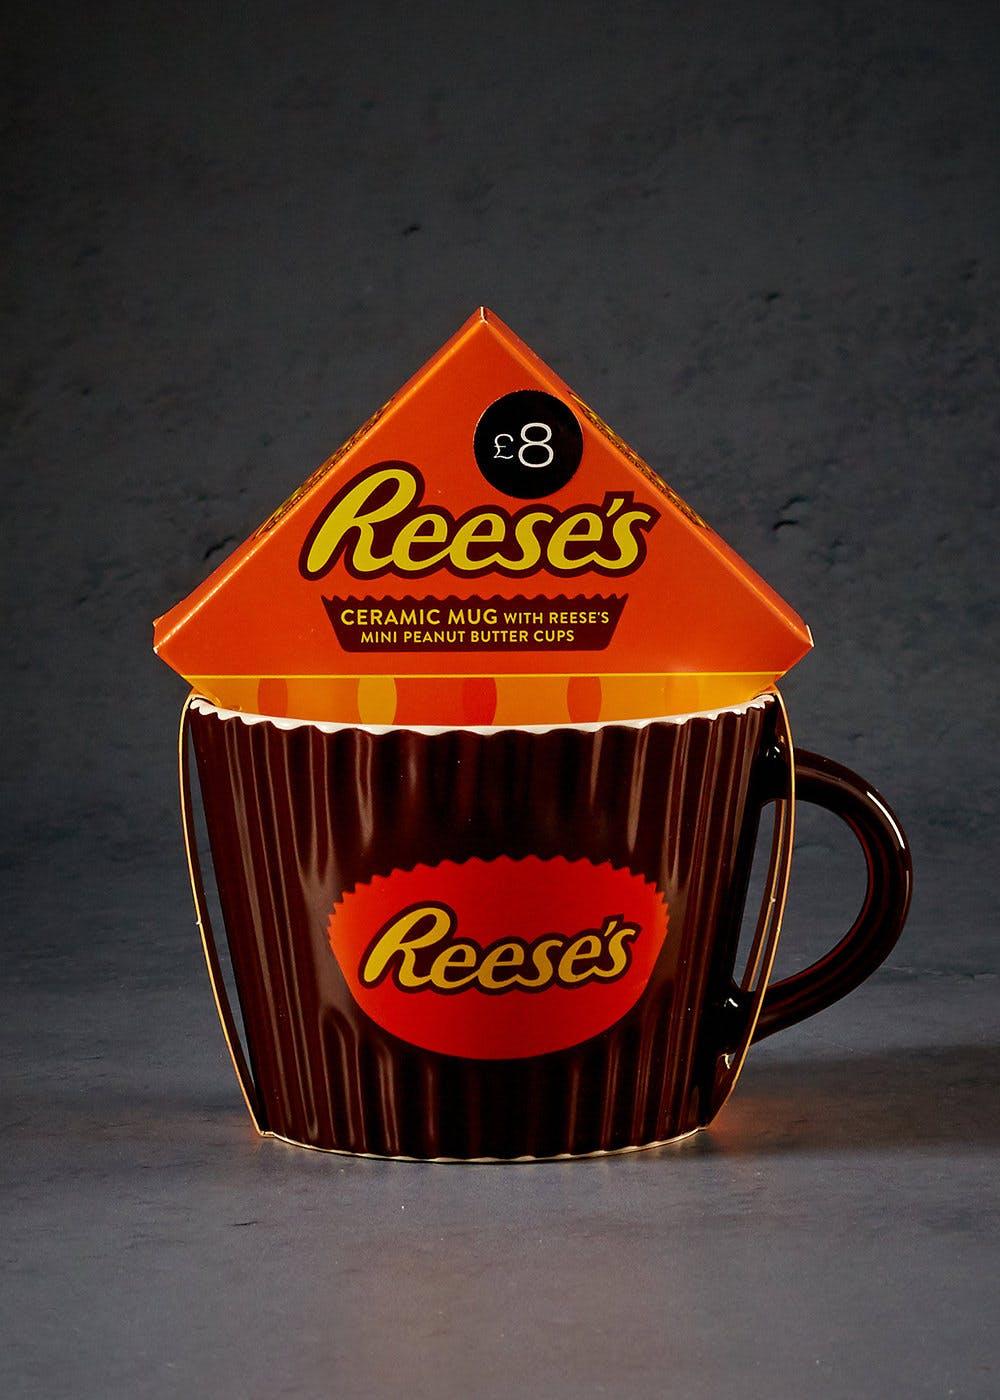 Reeses Mug & Mini Peanut Butter Cups Gift Set £6 @ Matalan Free C&C